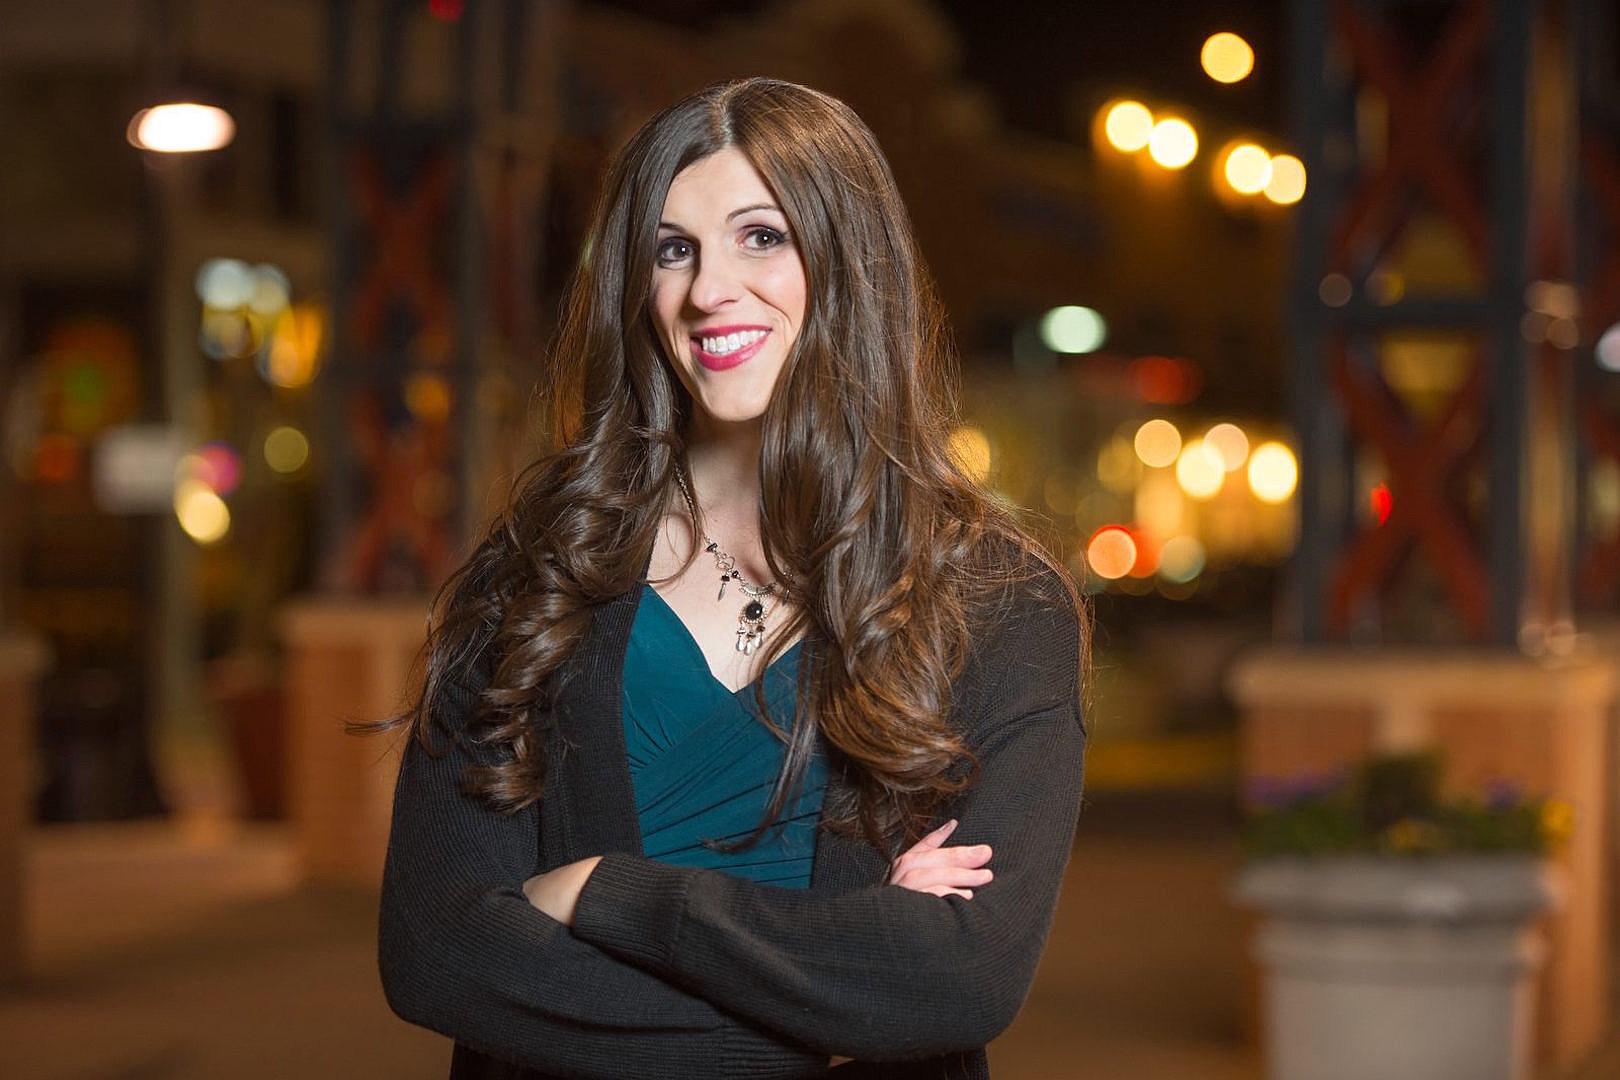 Transgender Metal Musician Danica Roem Wins District Election in Virginia